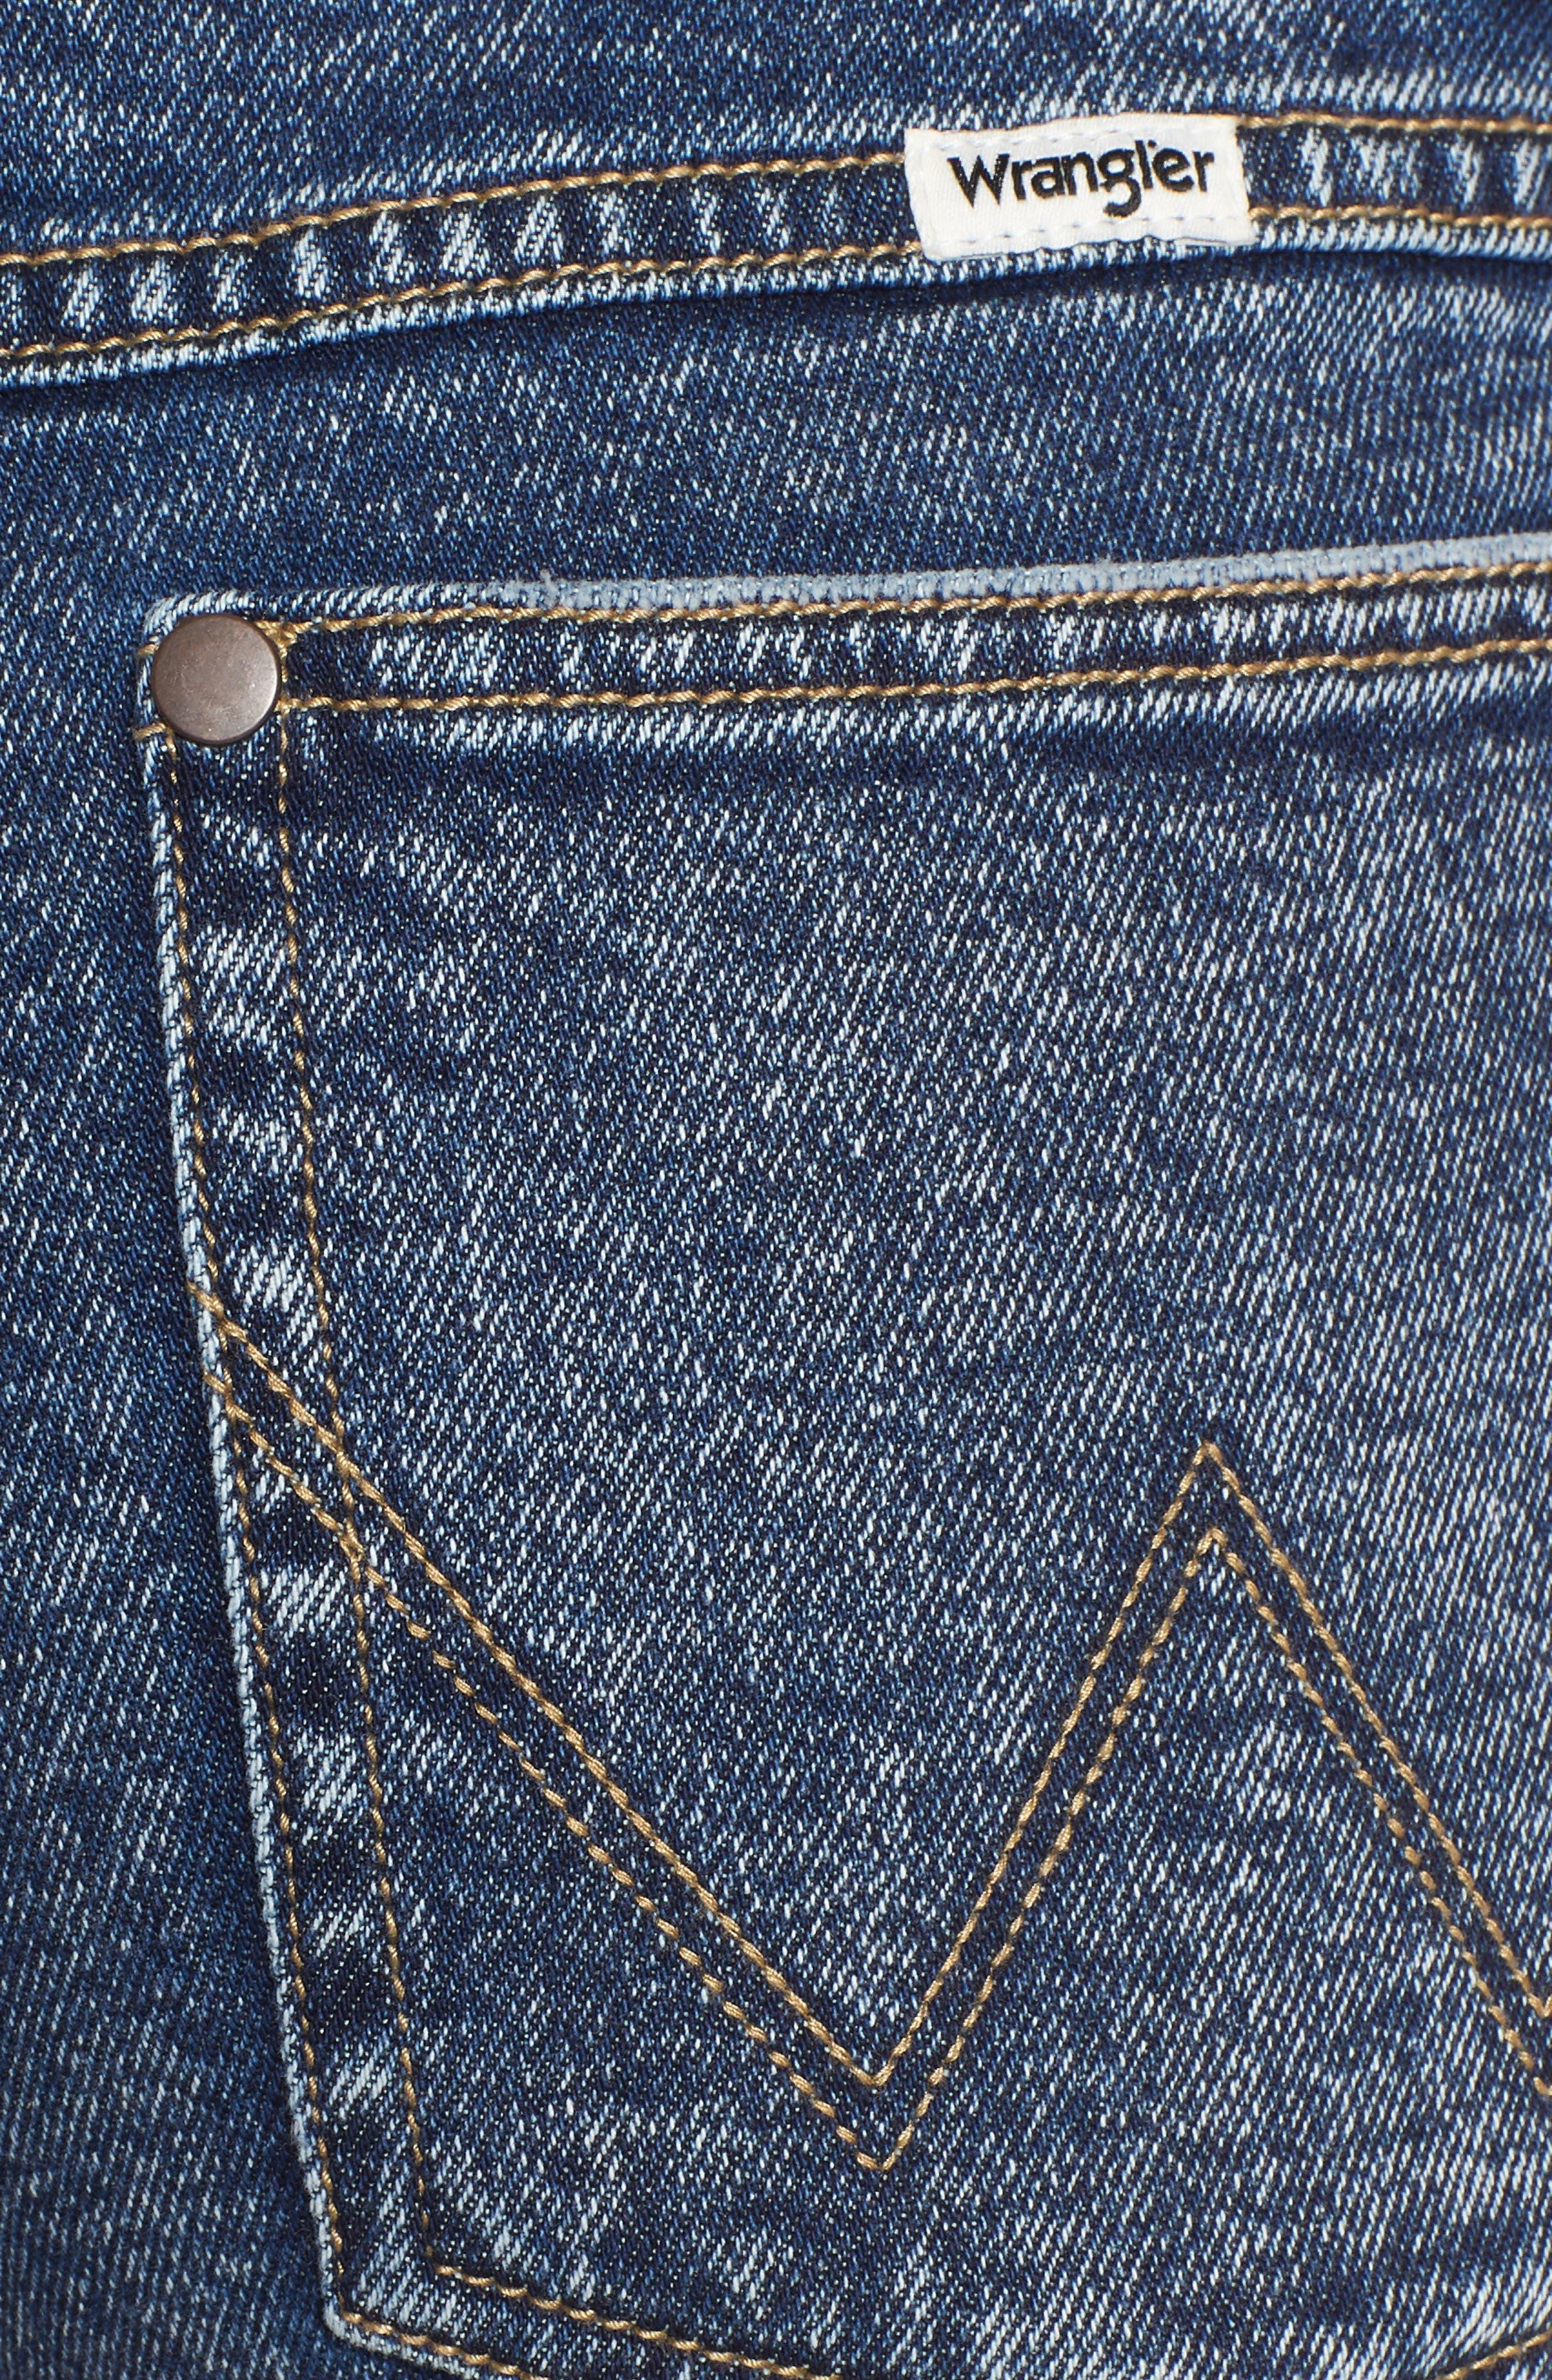 Acid Wash Denim Shorts,                             Alternate thumbnail 6, color,                             401